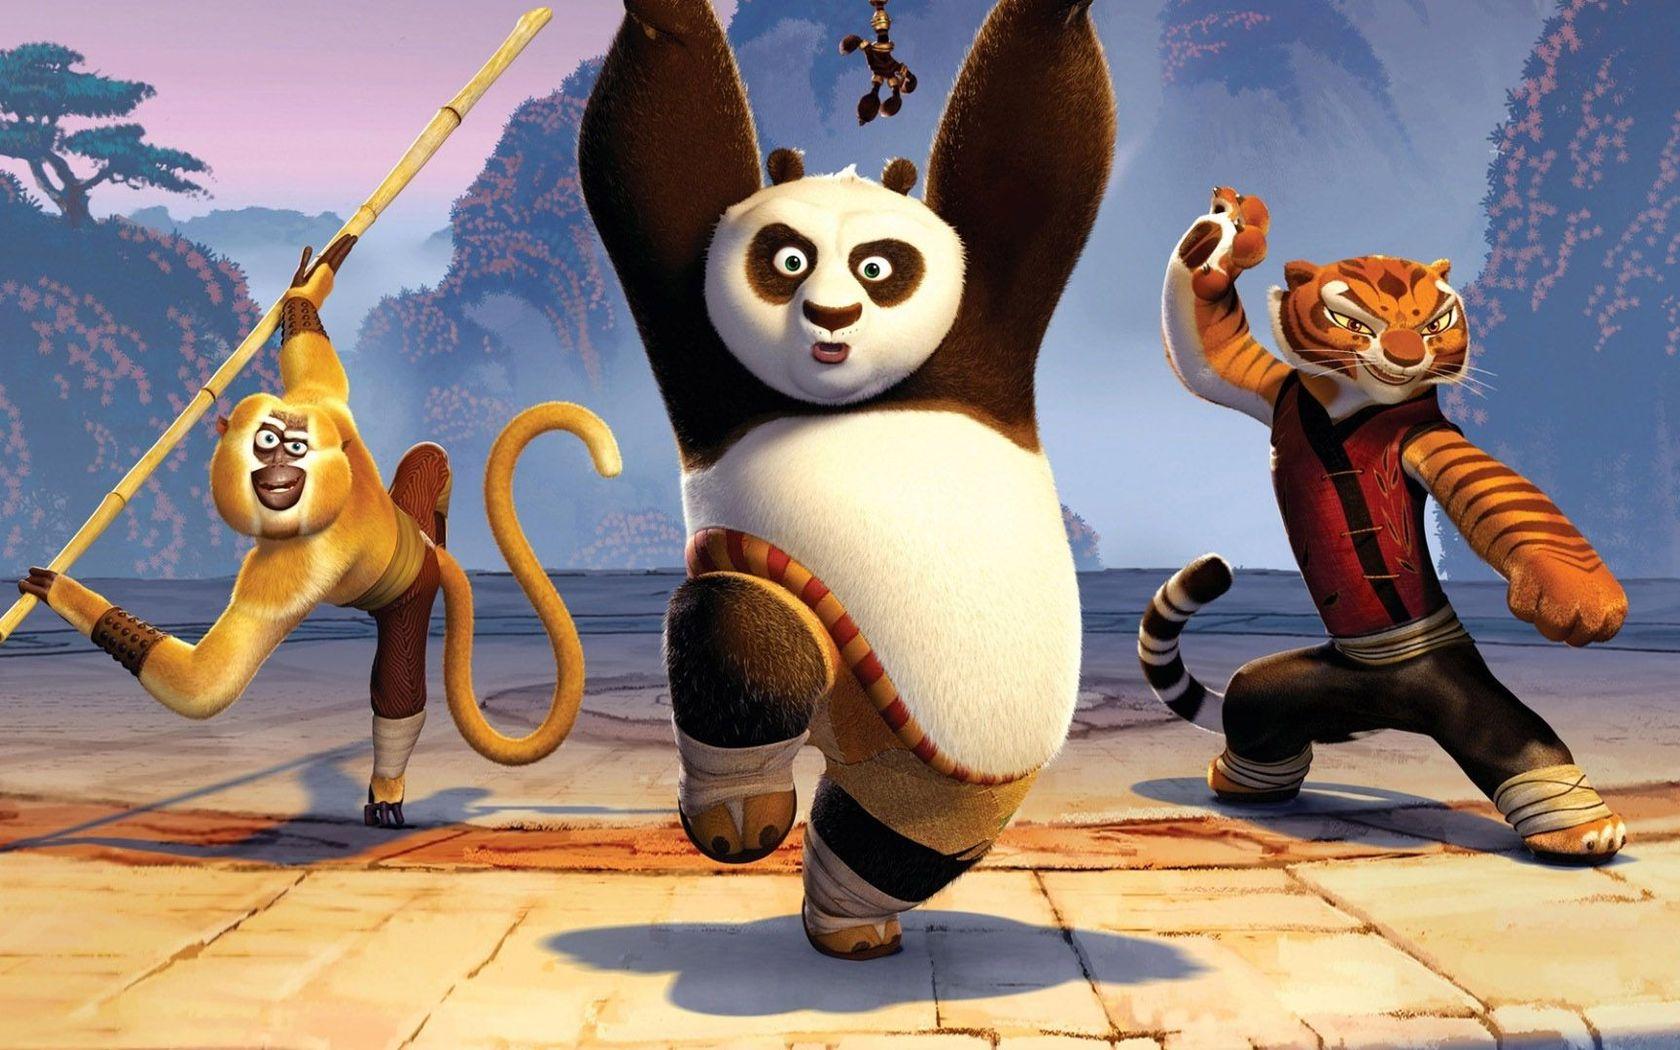 kung fu panda movie computer wallpaper 49415 1680x1050 px